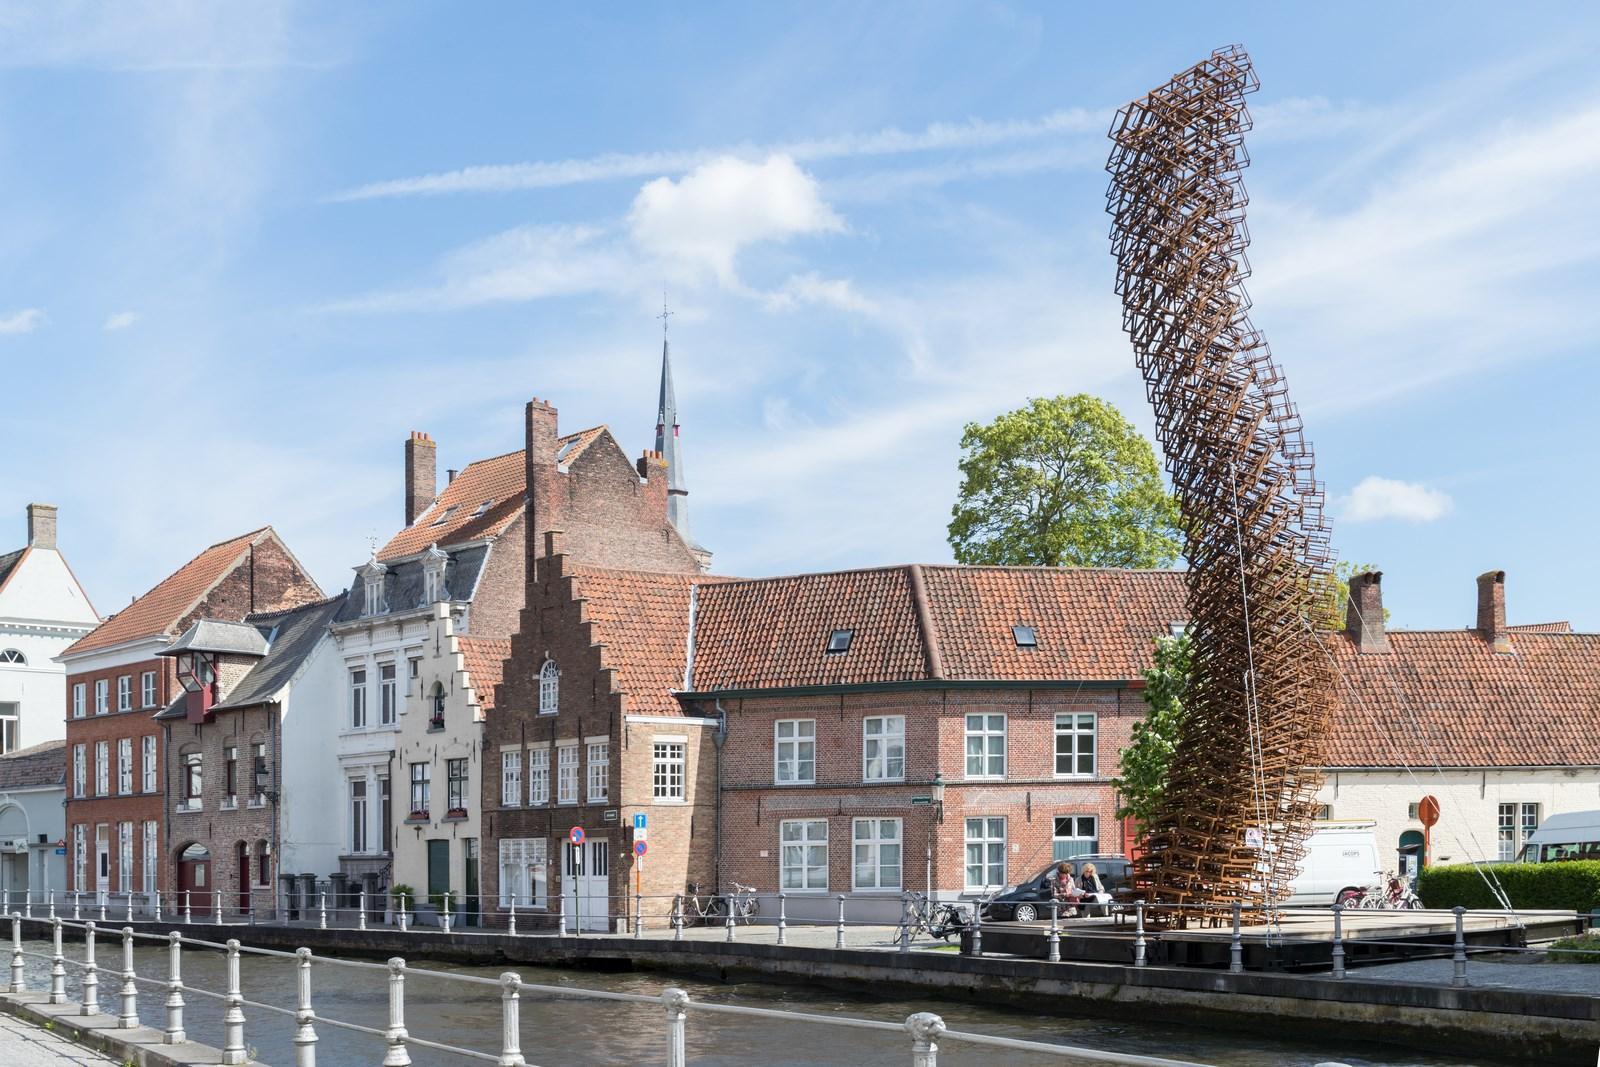 Triennale Brugge 2018_John Powers_Lanchals_1 Foto Iwan Baan (Copy)